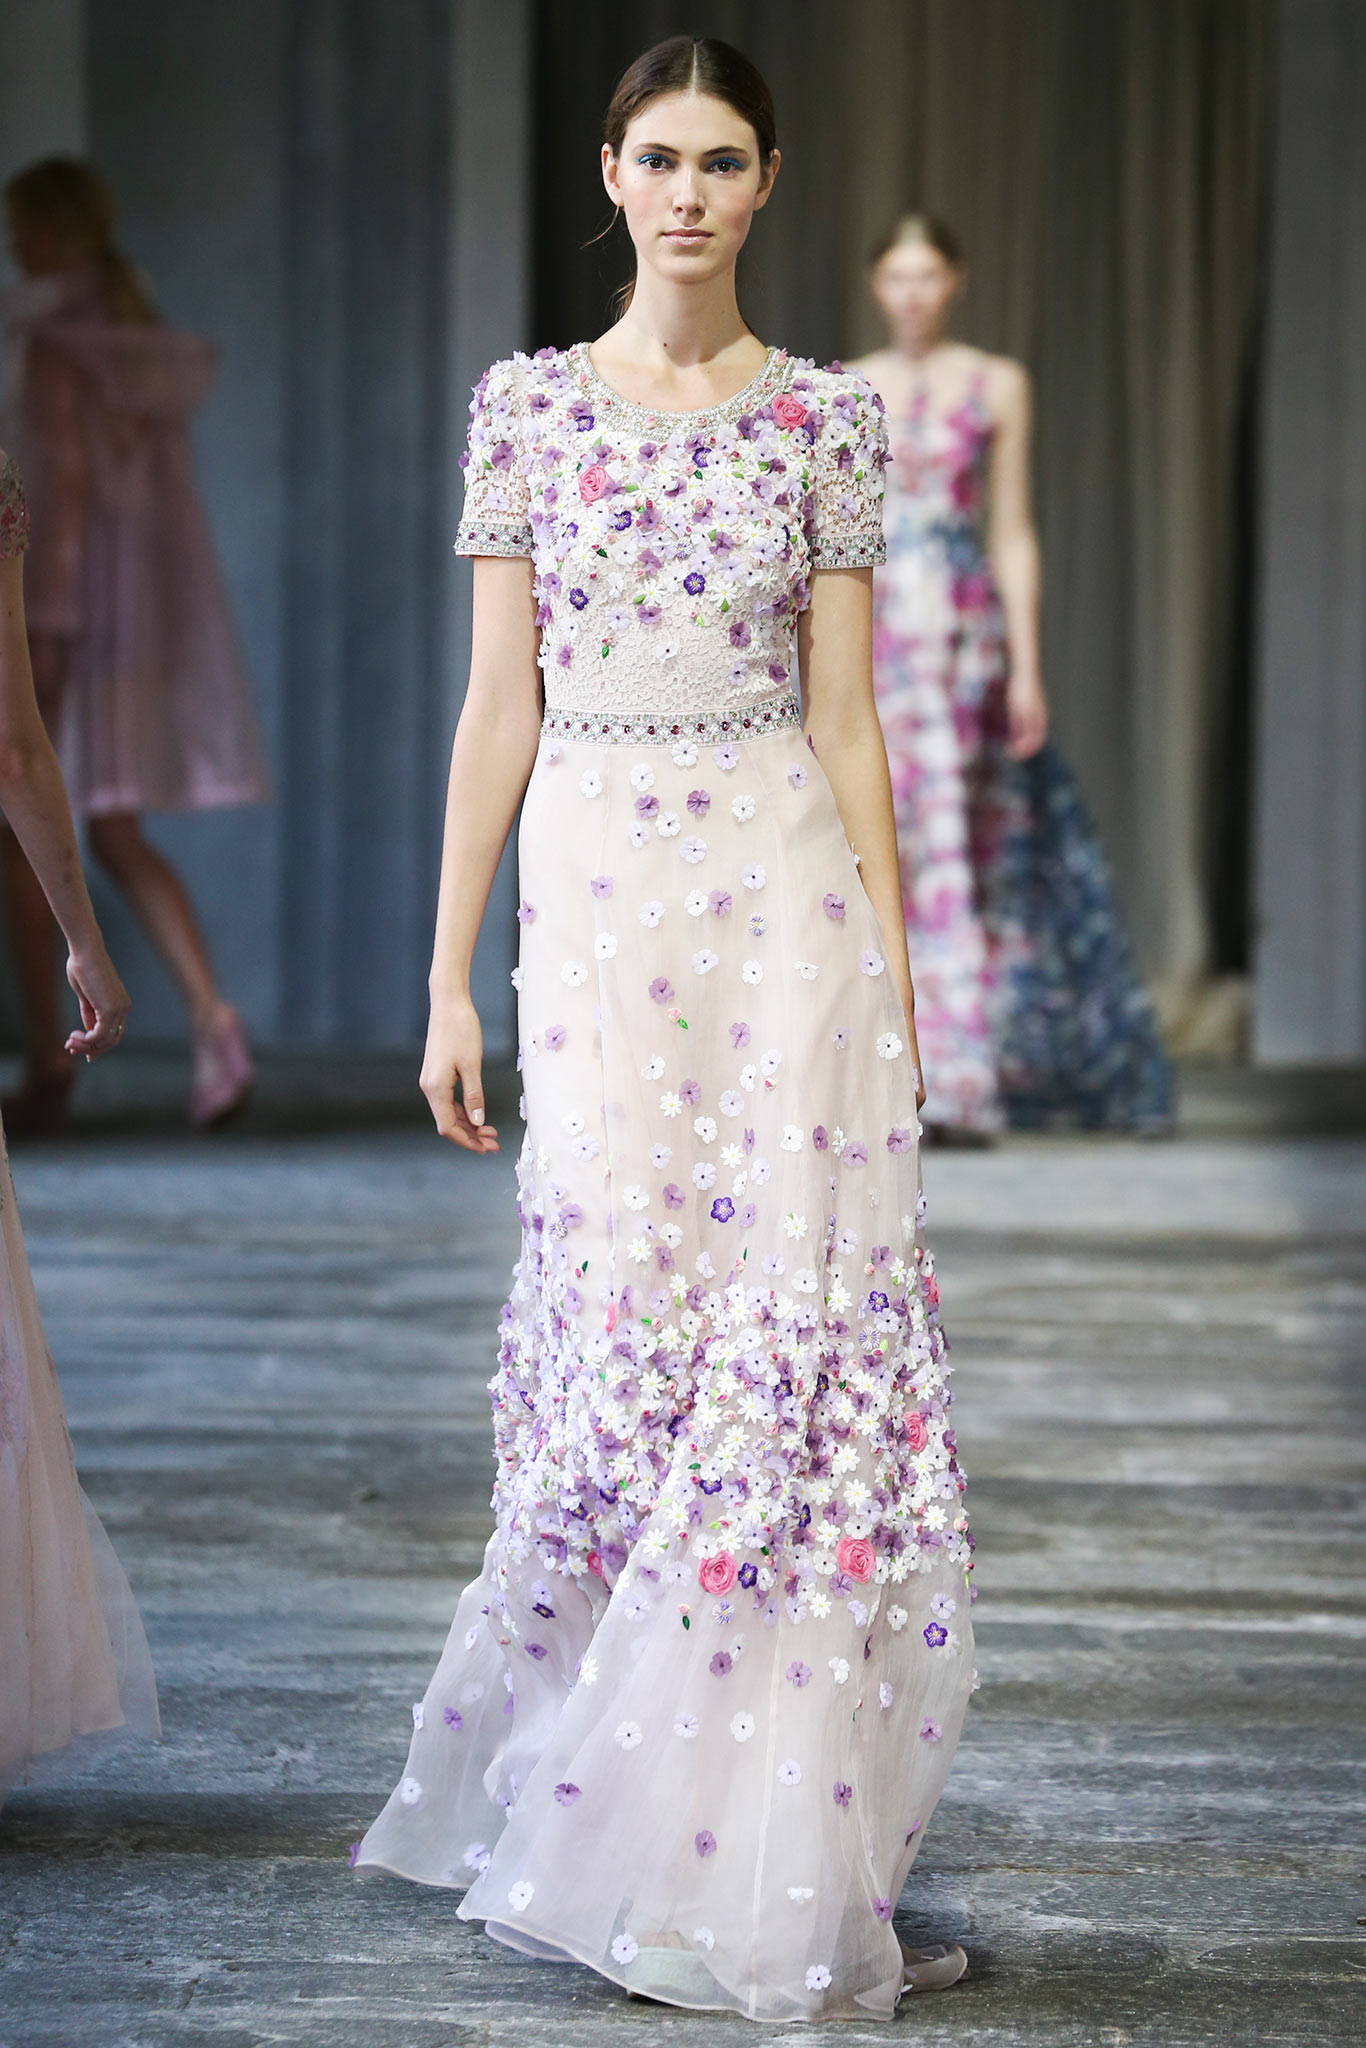 43582382c448 Plesové šaty 2015 – vyrazte na ples s talianskou noblesou!